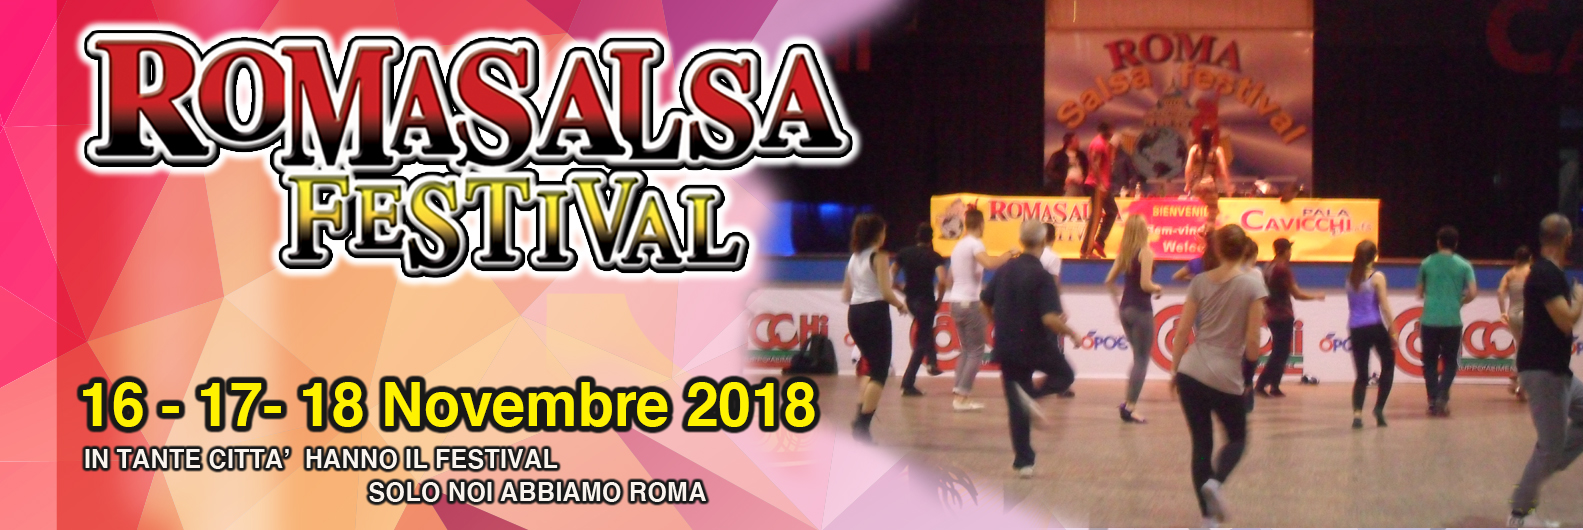 roma-salsa-festival-sito-homepage-pag-3-2017